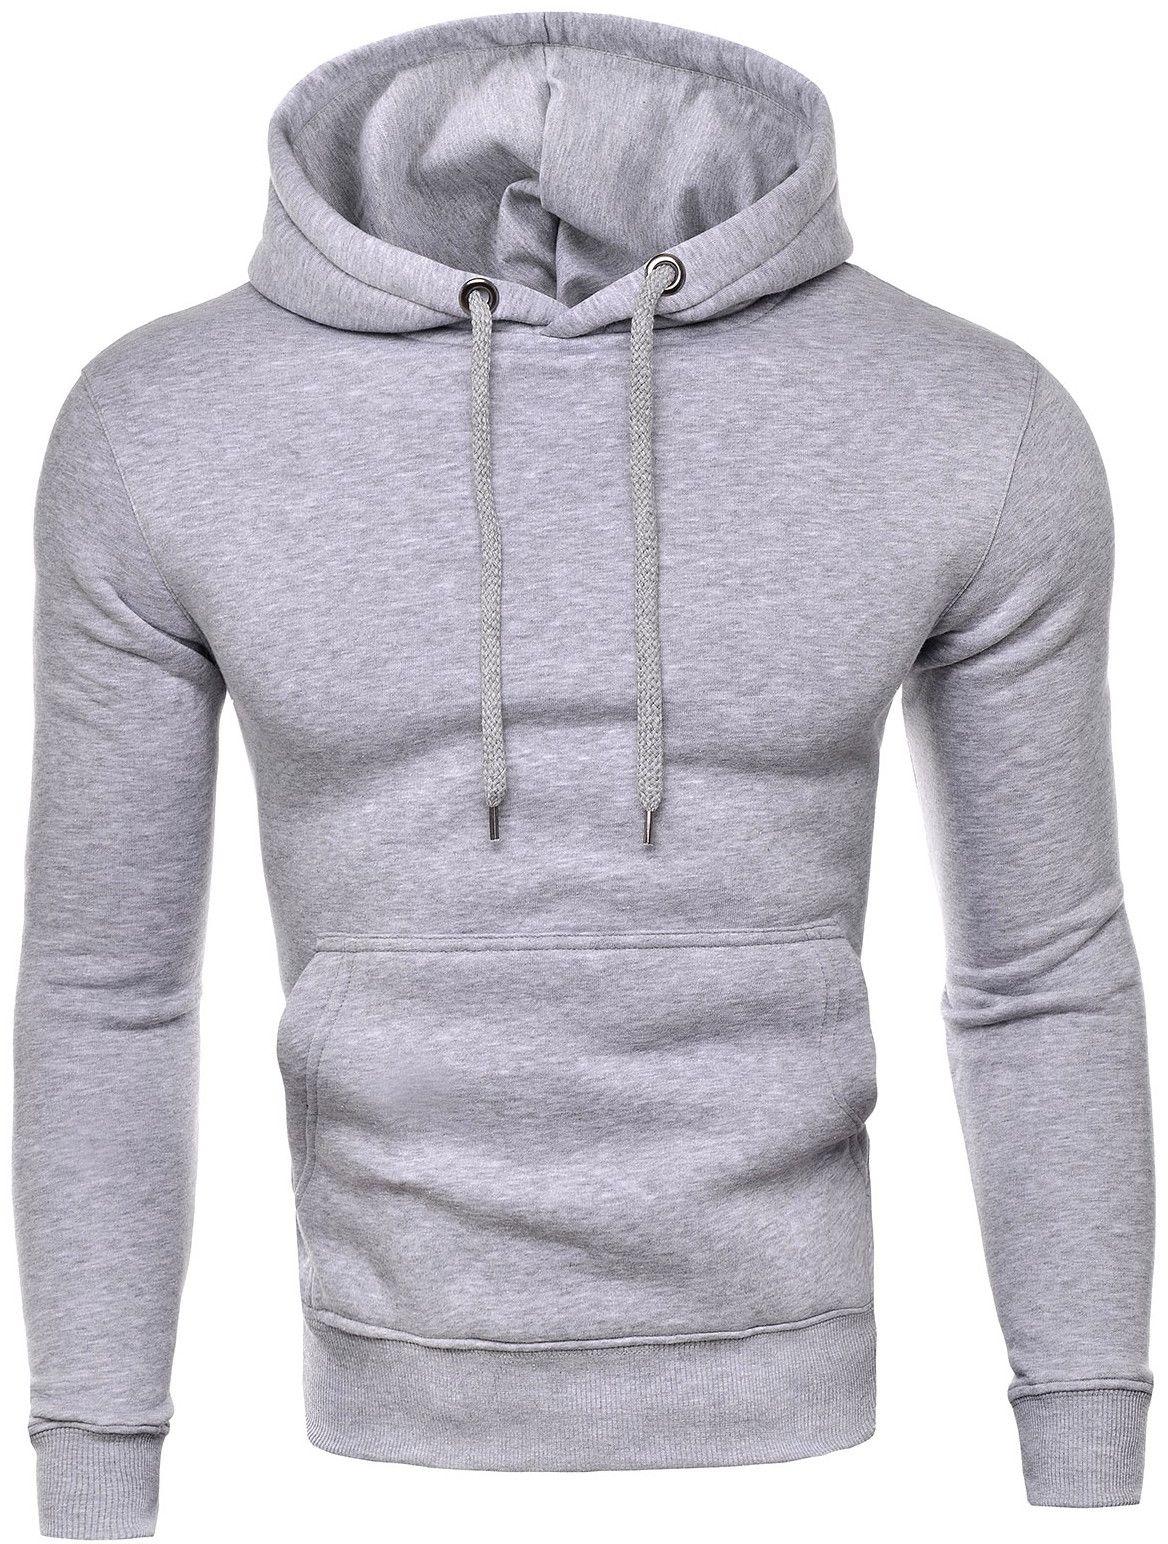 Męska ciepła bluza rdi1911 - szara